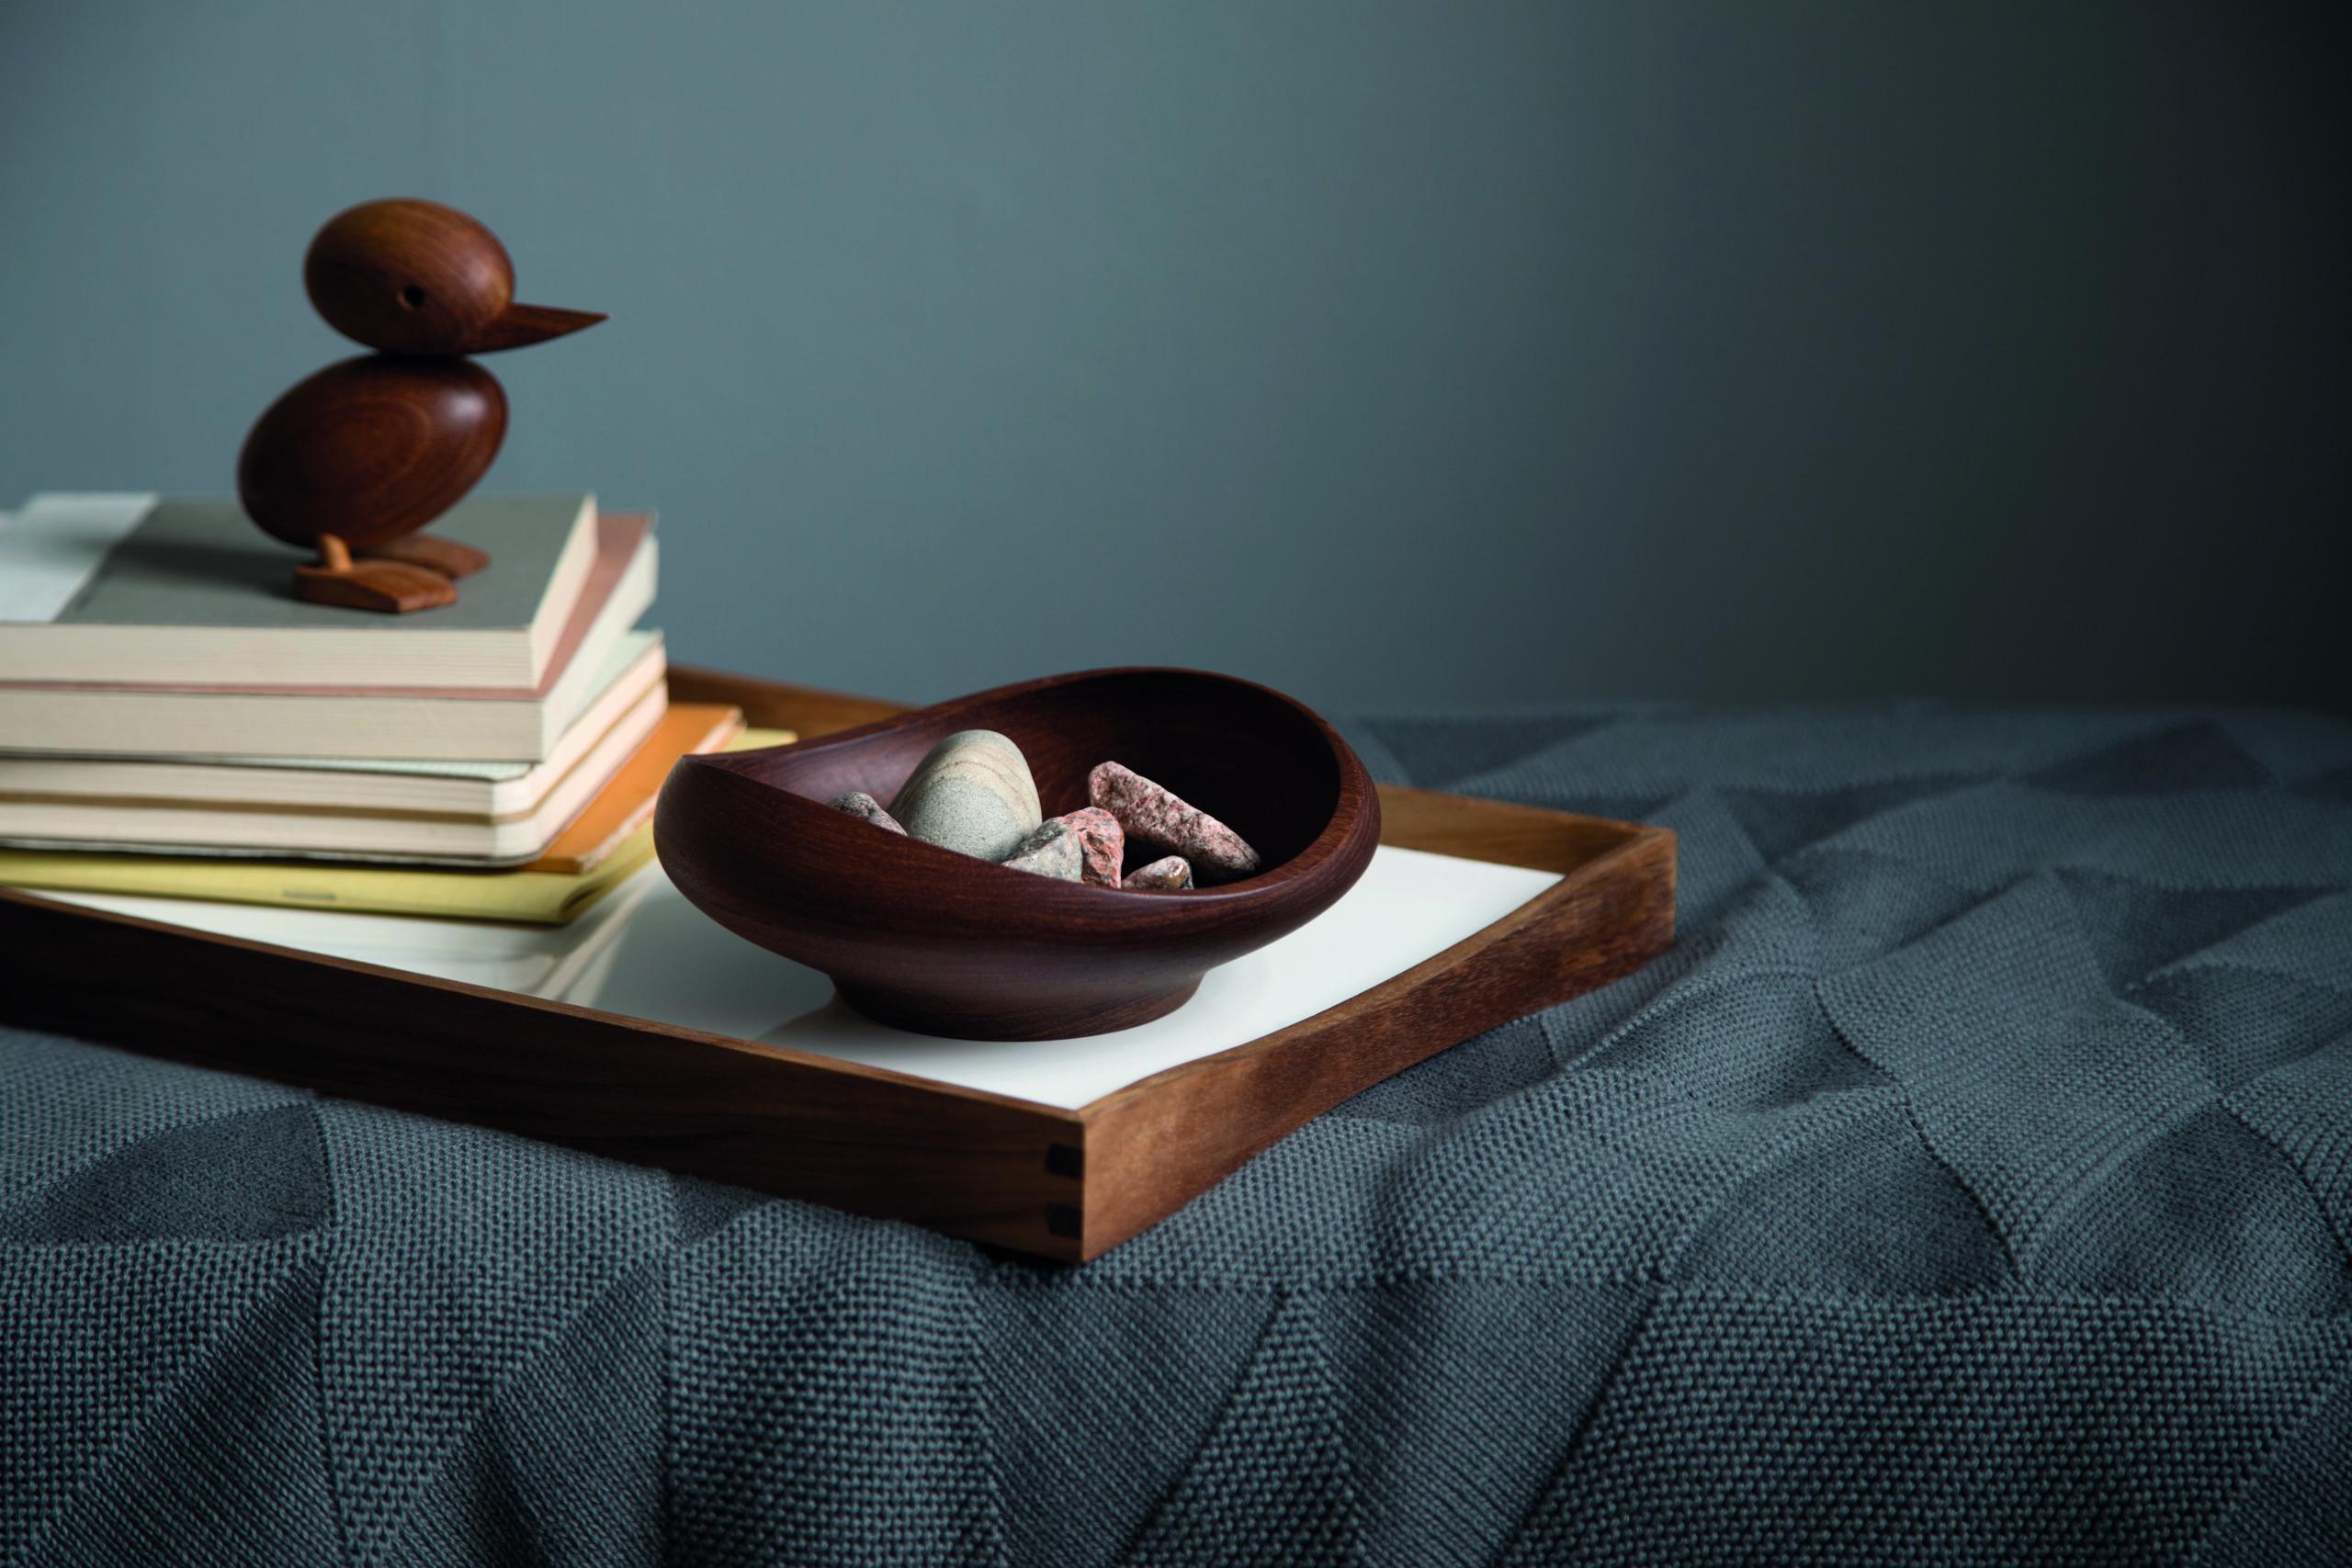 Architectmade-FJ-Pattern-Organic-Cotton-Pillows-Blankets-Denmark-Finn-Juhl-8